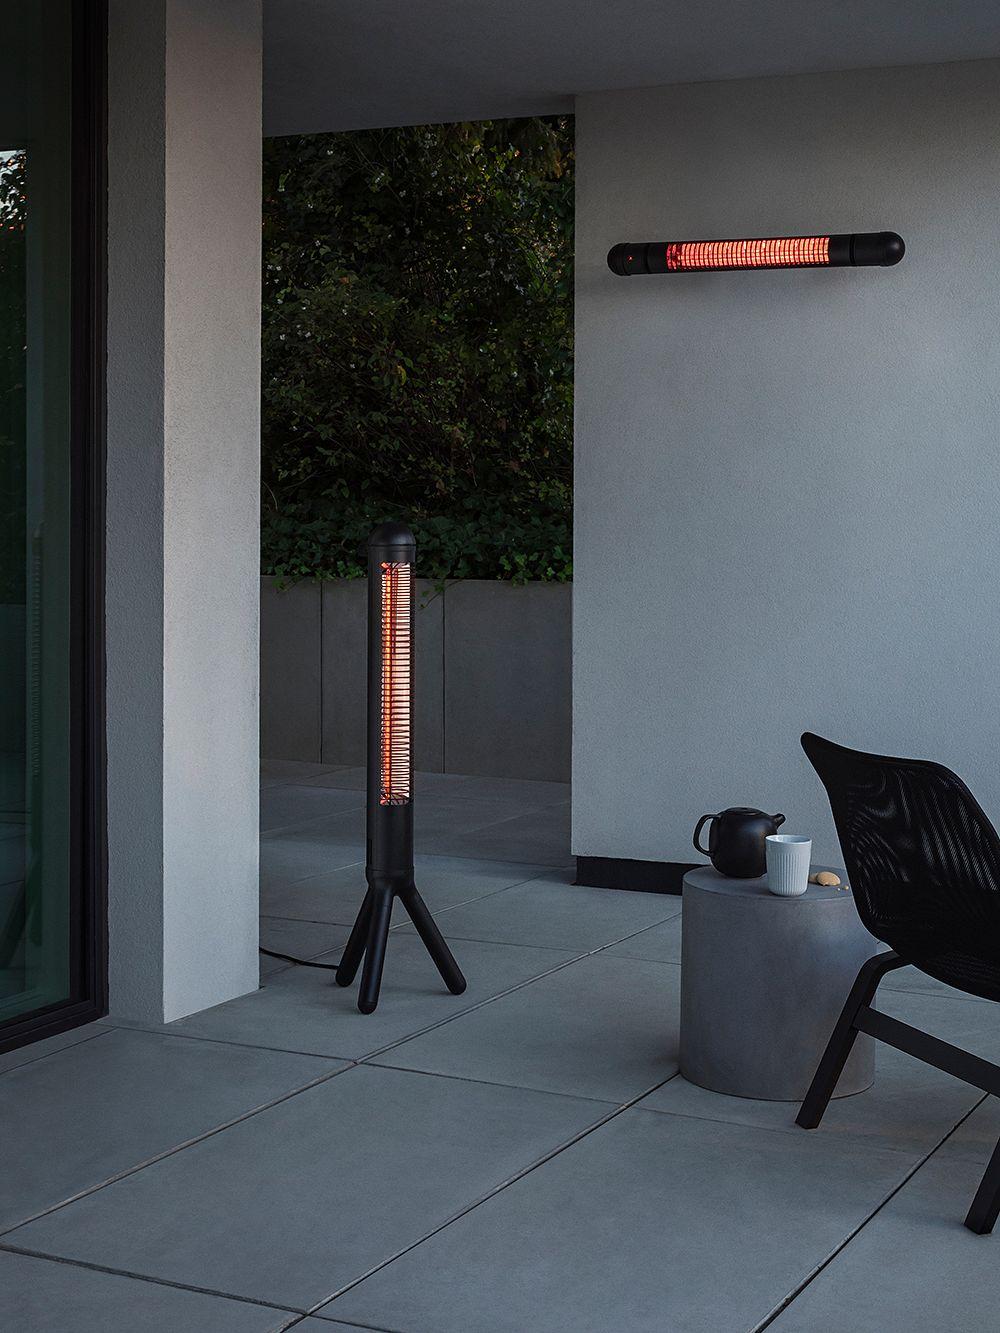 Eva Solo HeatUp electric patio heater